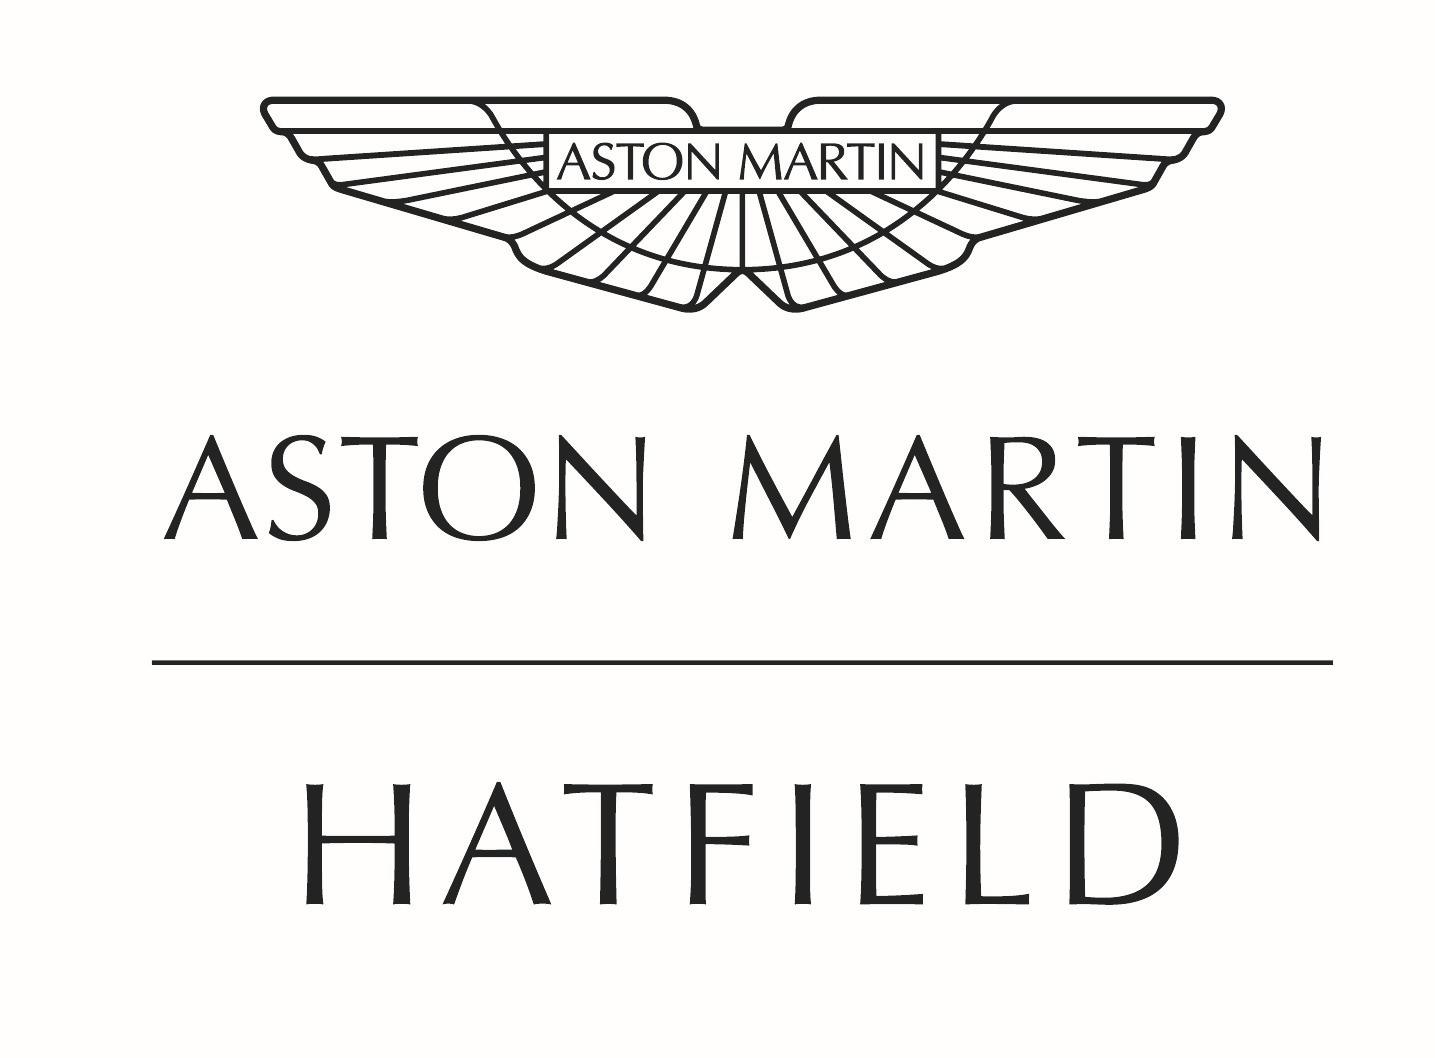 Aston Martin New Vantage 2dr ZF 8 Speed image 3